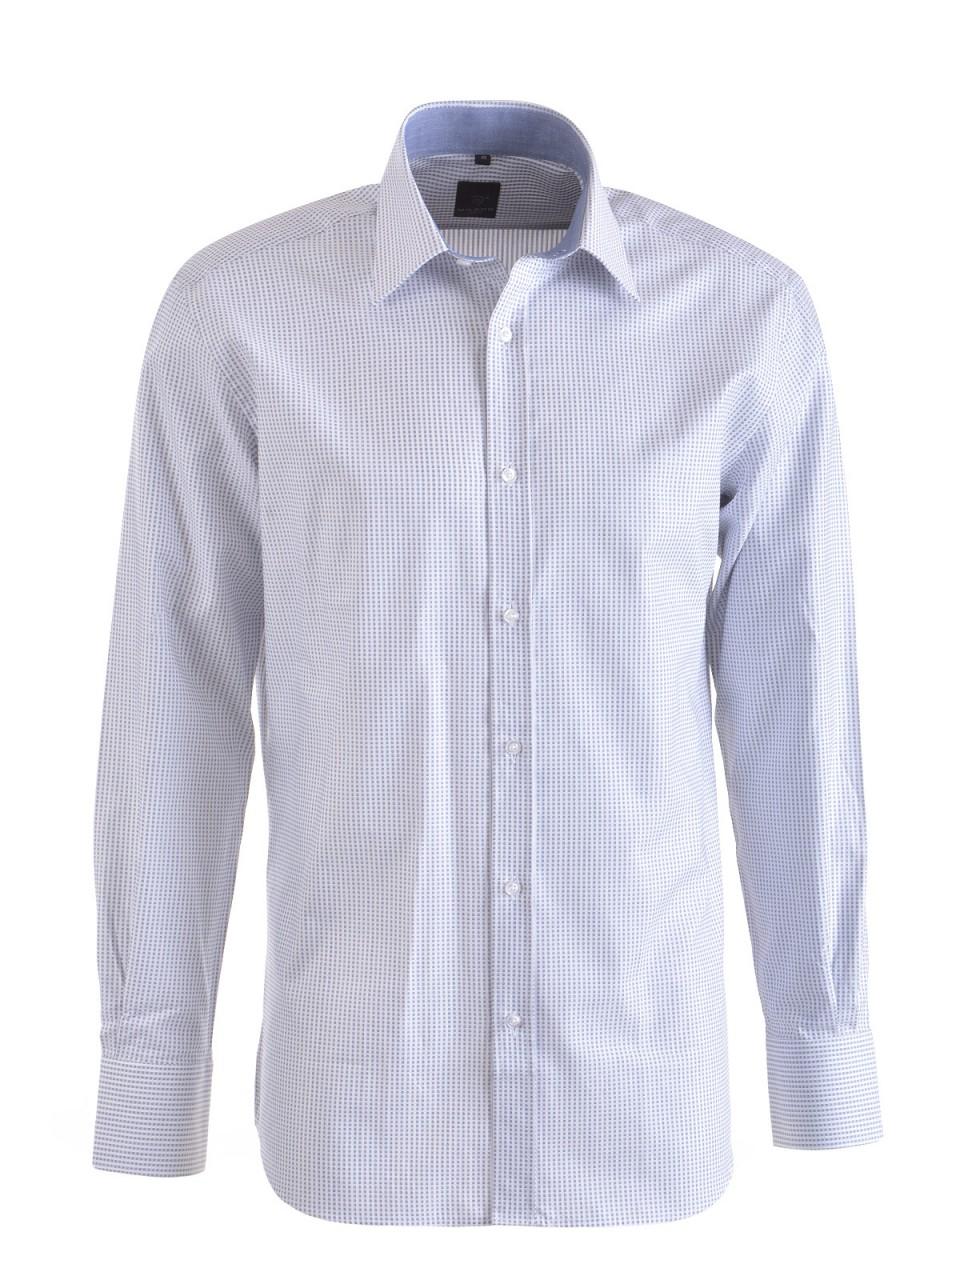 milano-italy-herren-hemd-wei-szlig-blau